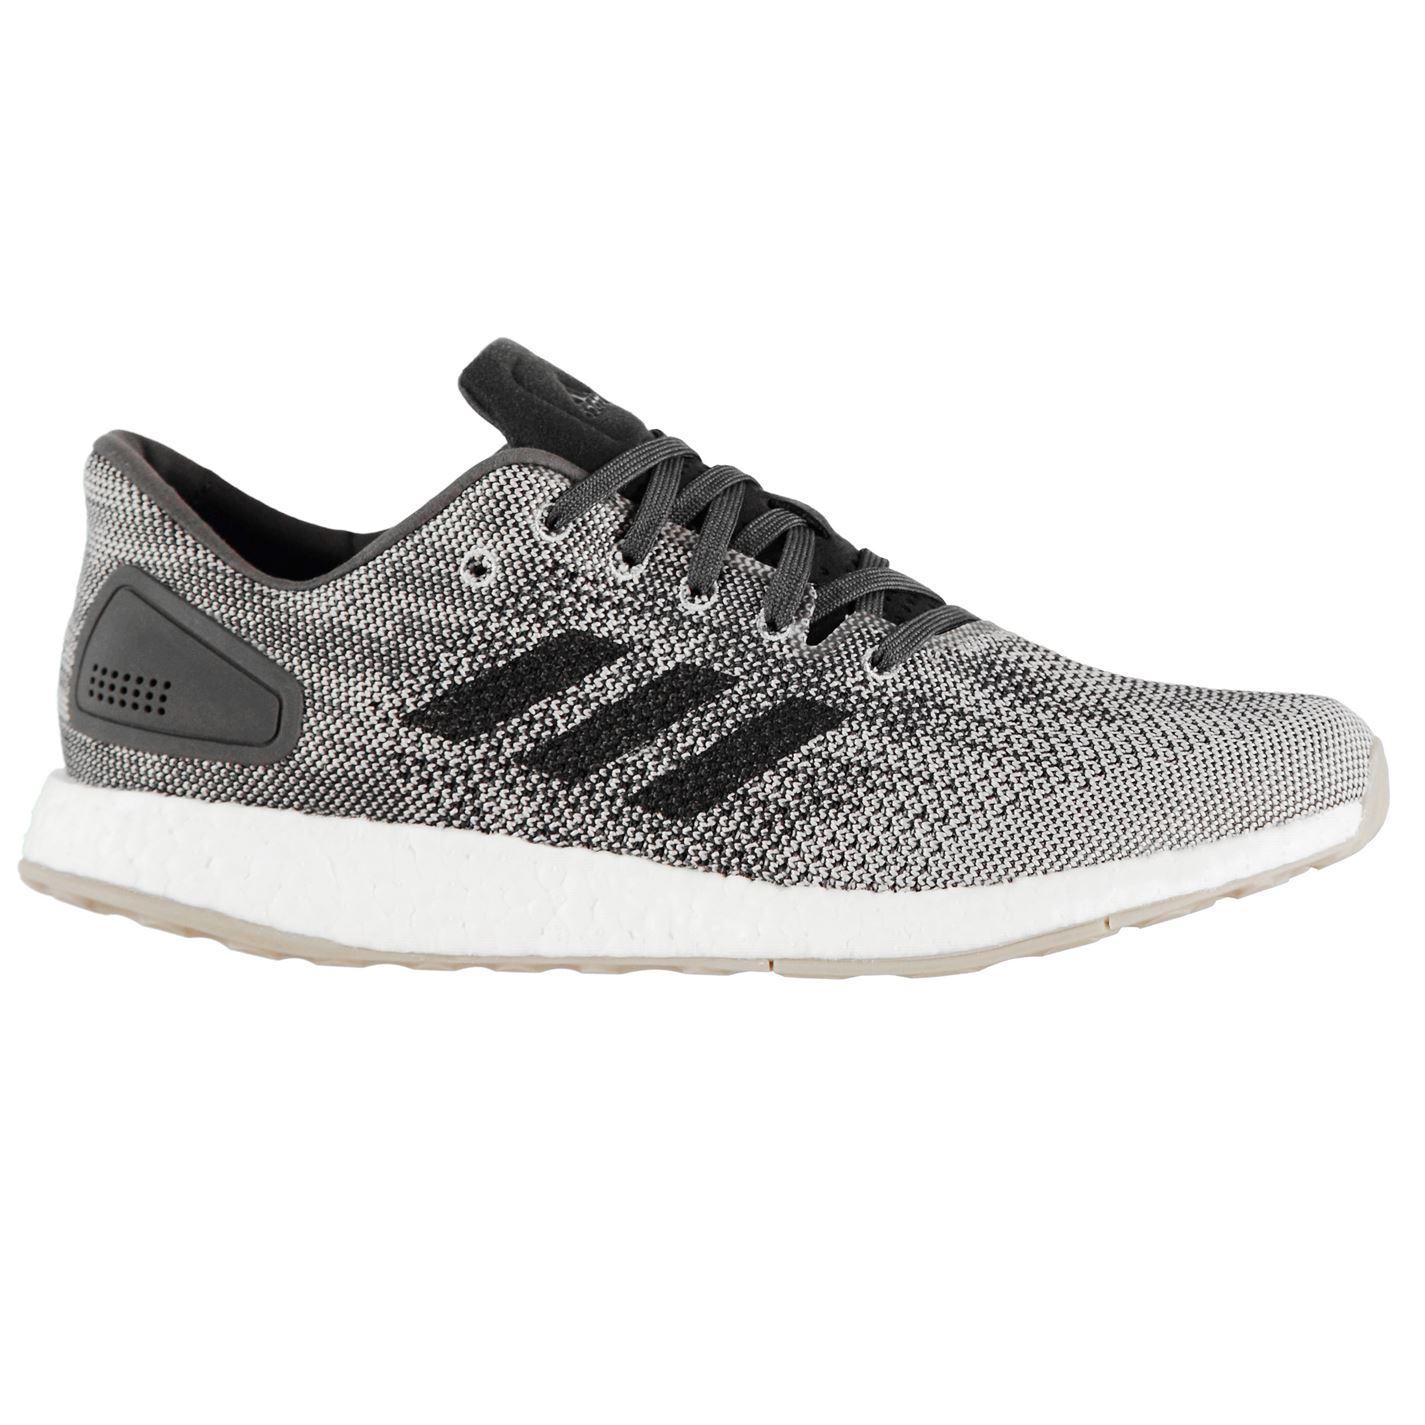 Adidas PureBoost DPR pánské běžecké tenisky